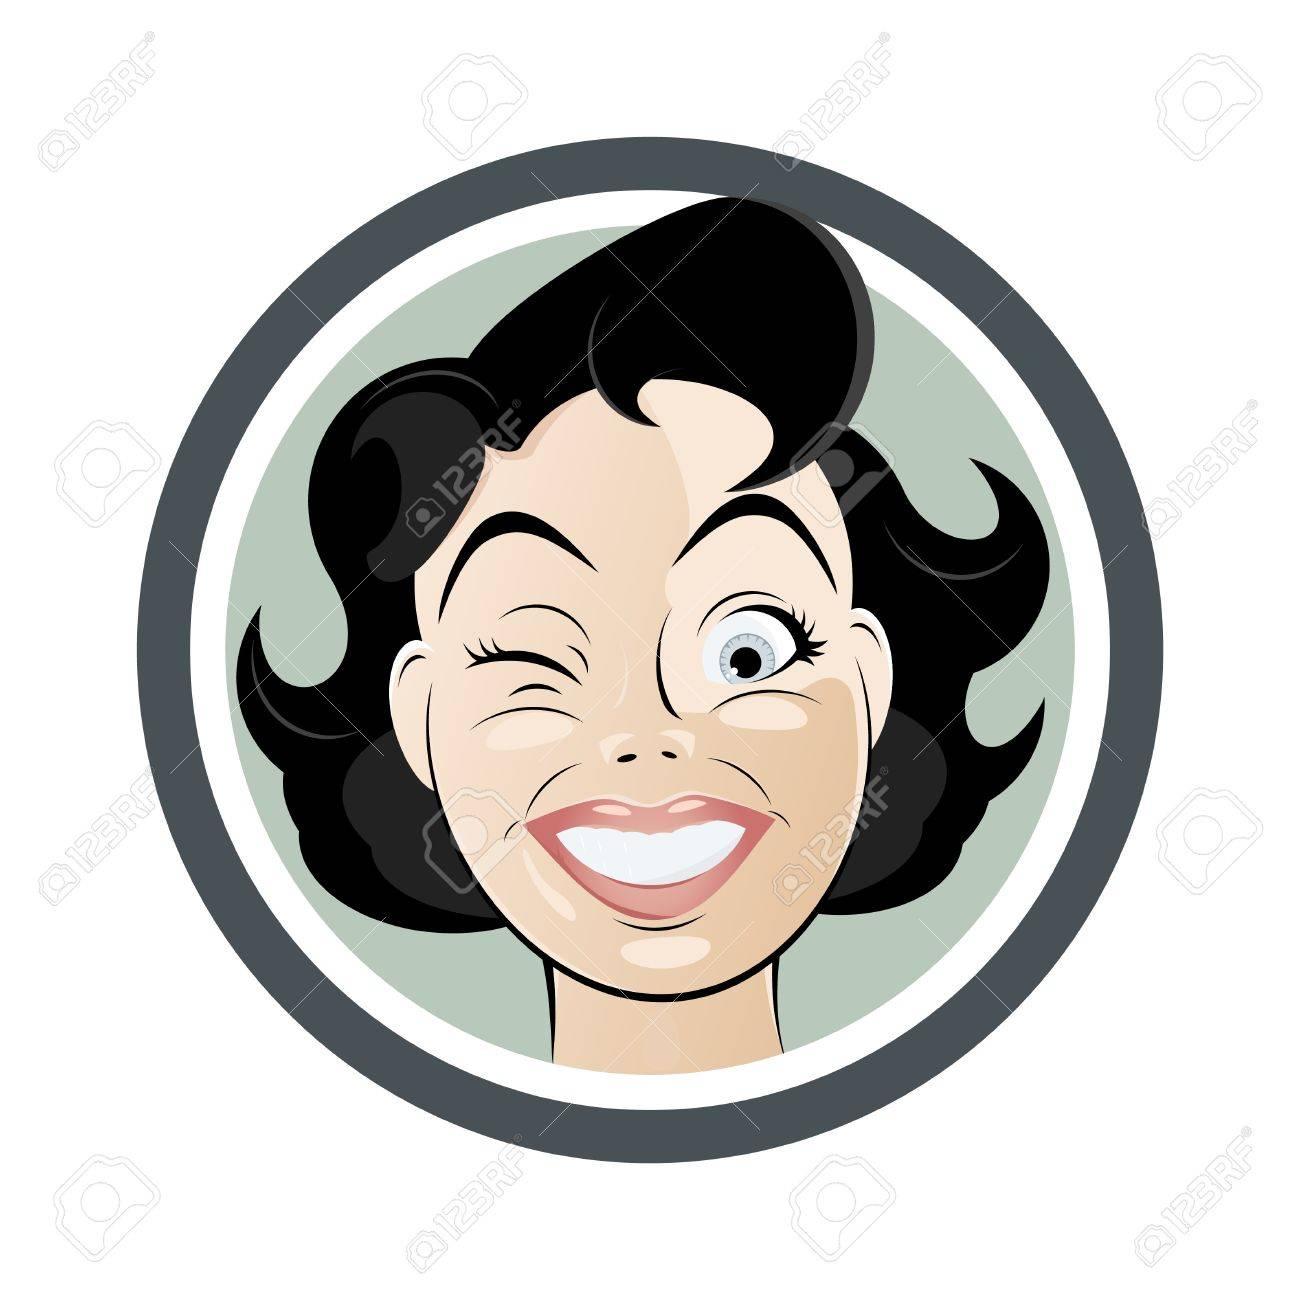 winking cartoon woman - 13206444